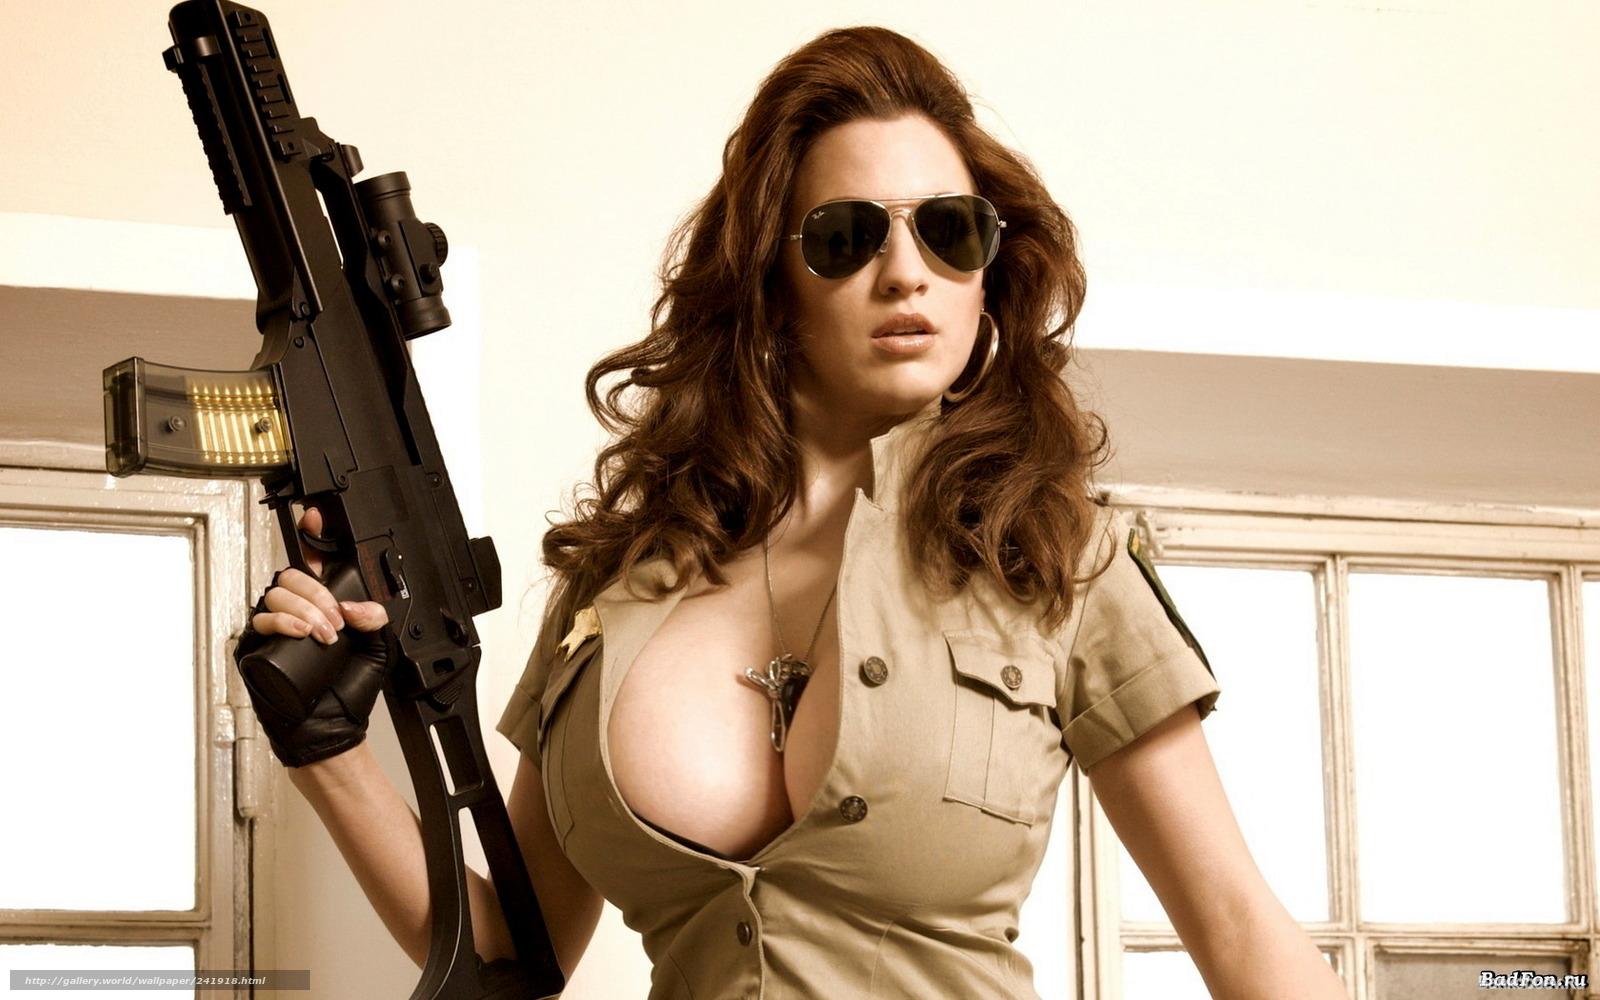 Секси девушки с оружием фото 24 фотография